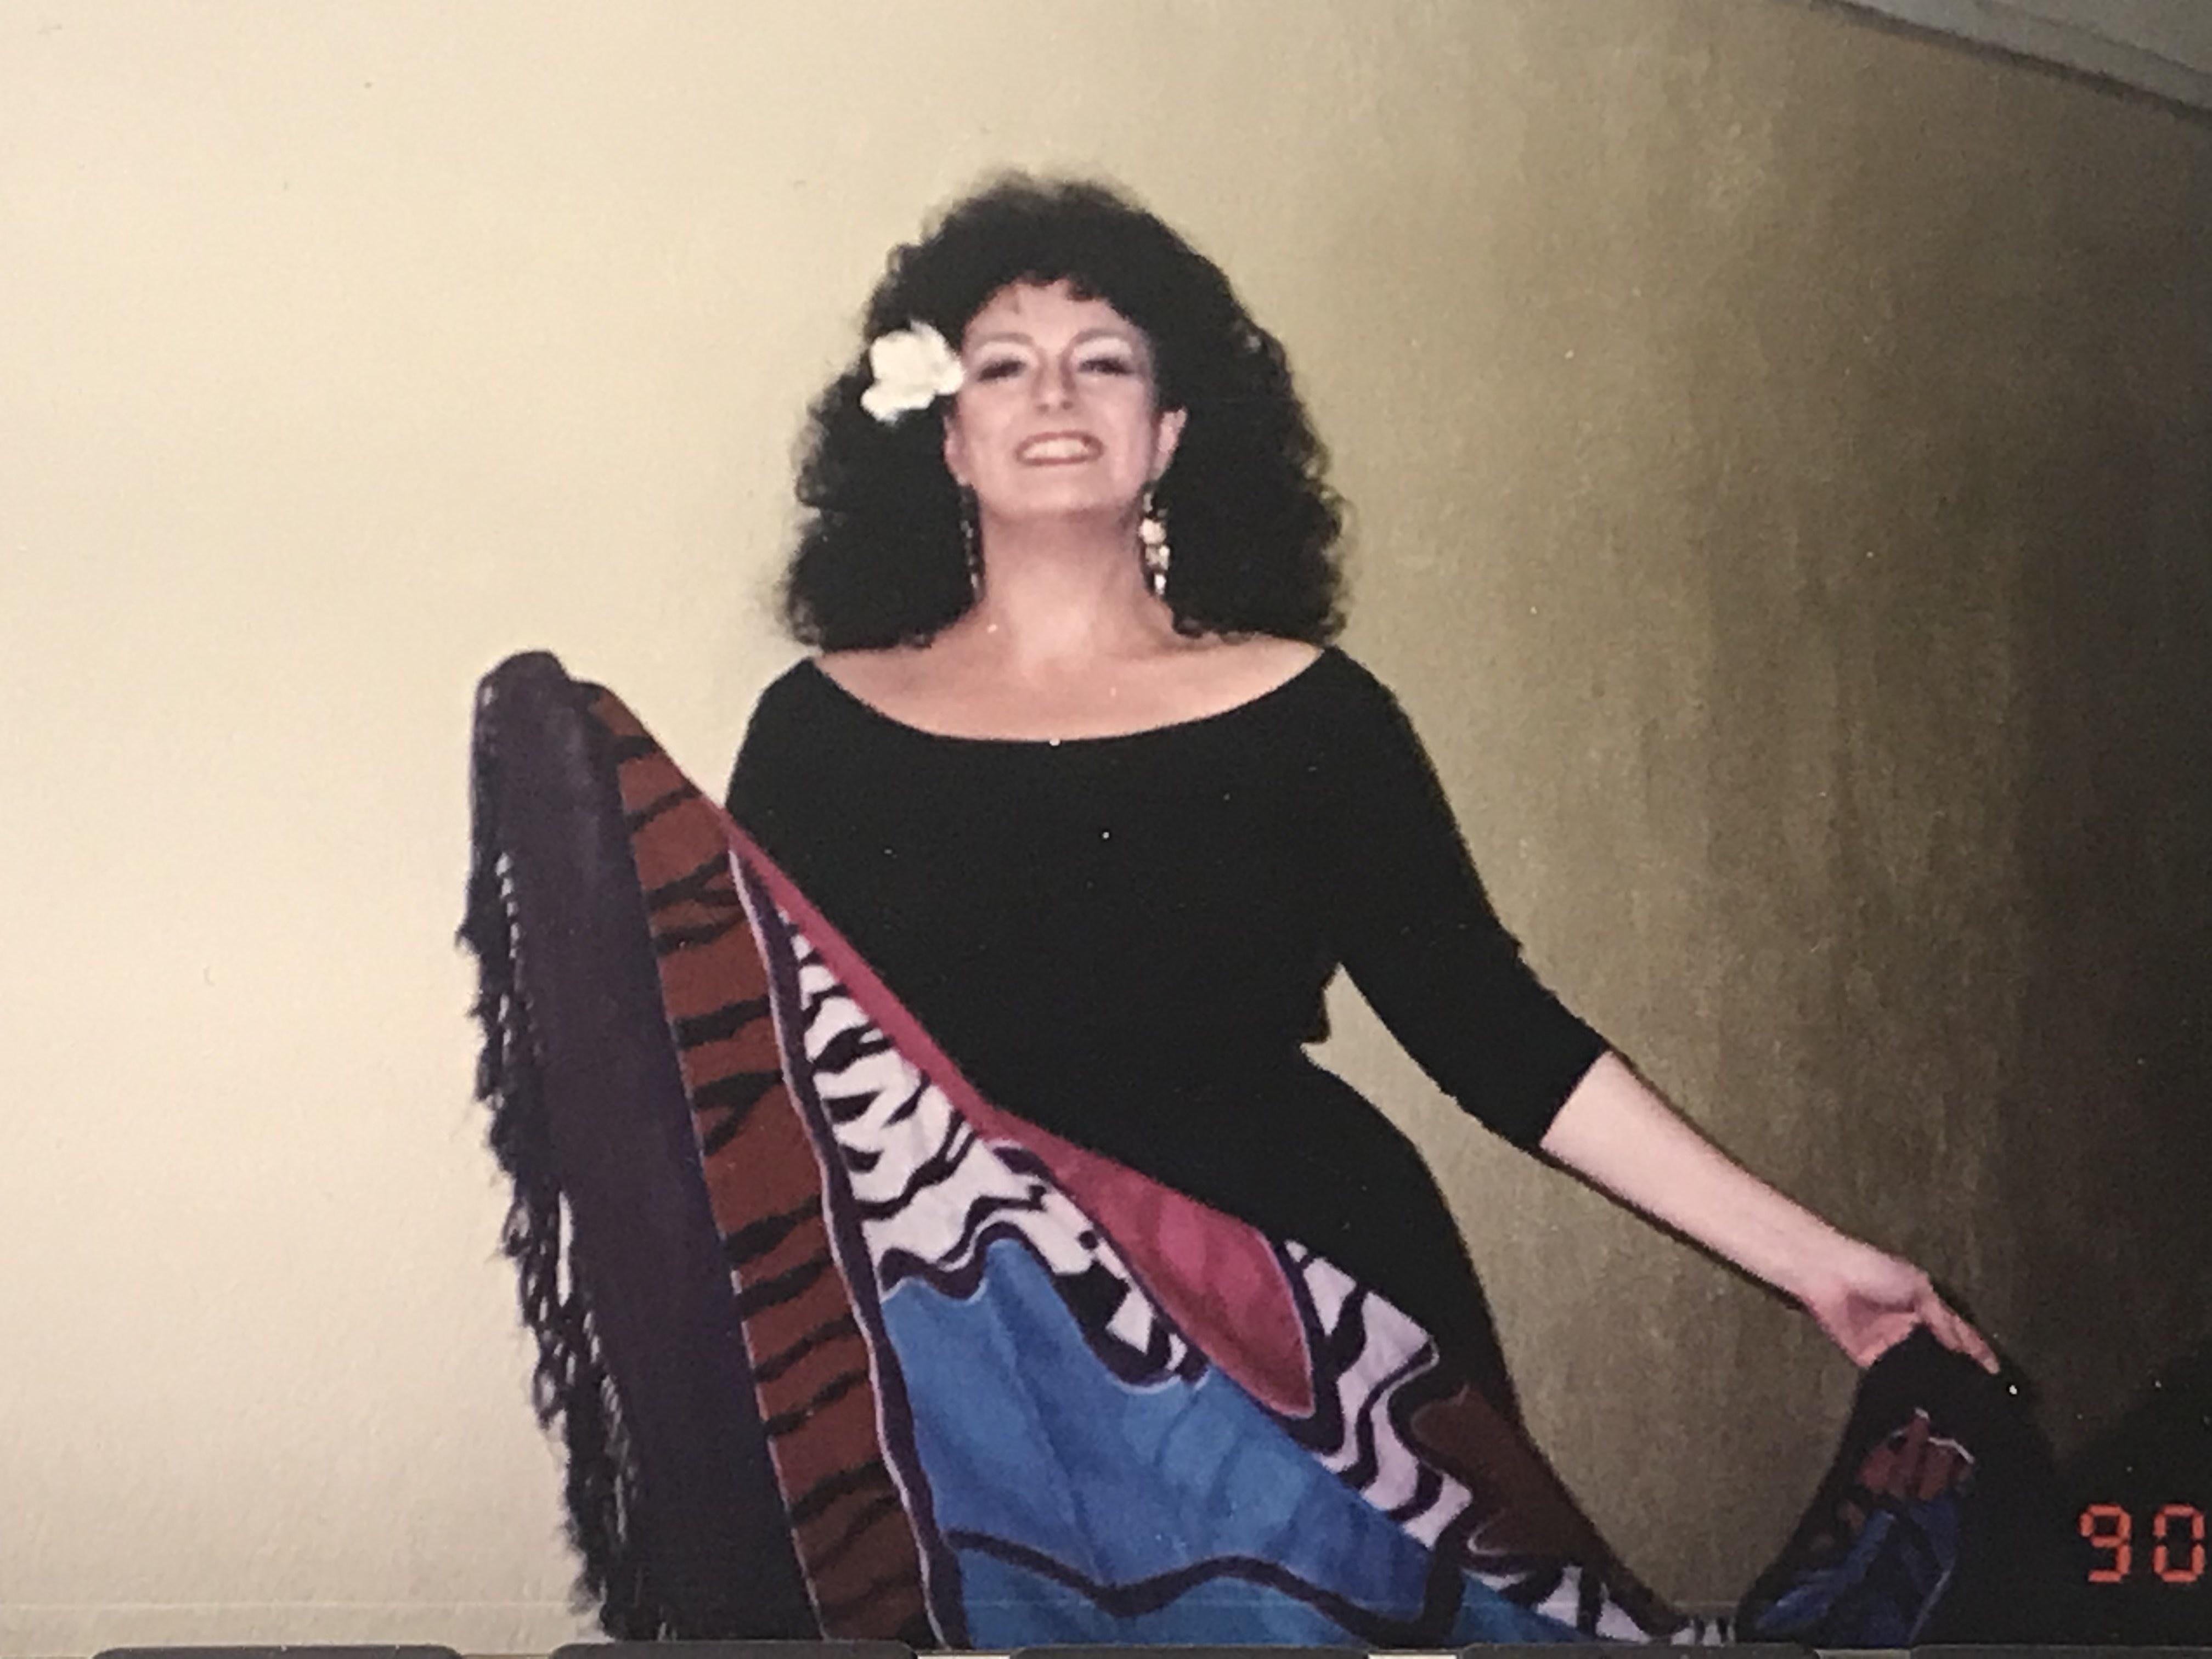 Regina Opera Carmen, 1989 - Act I costume